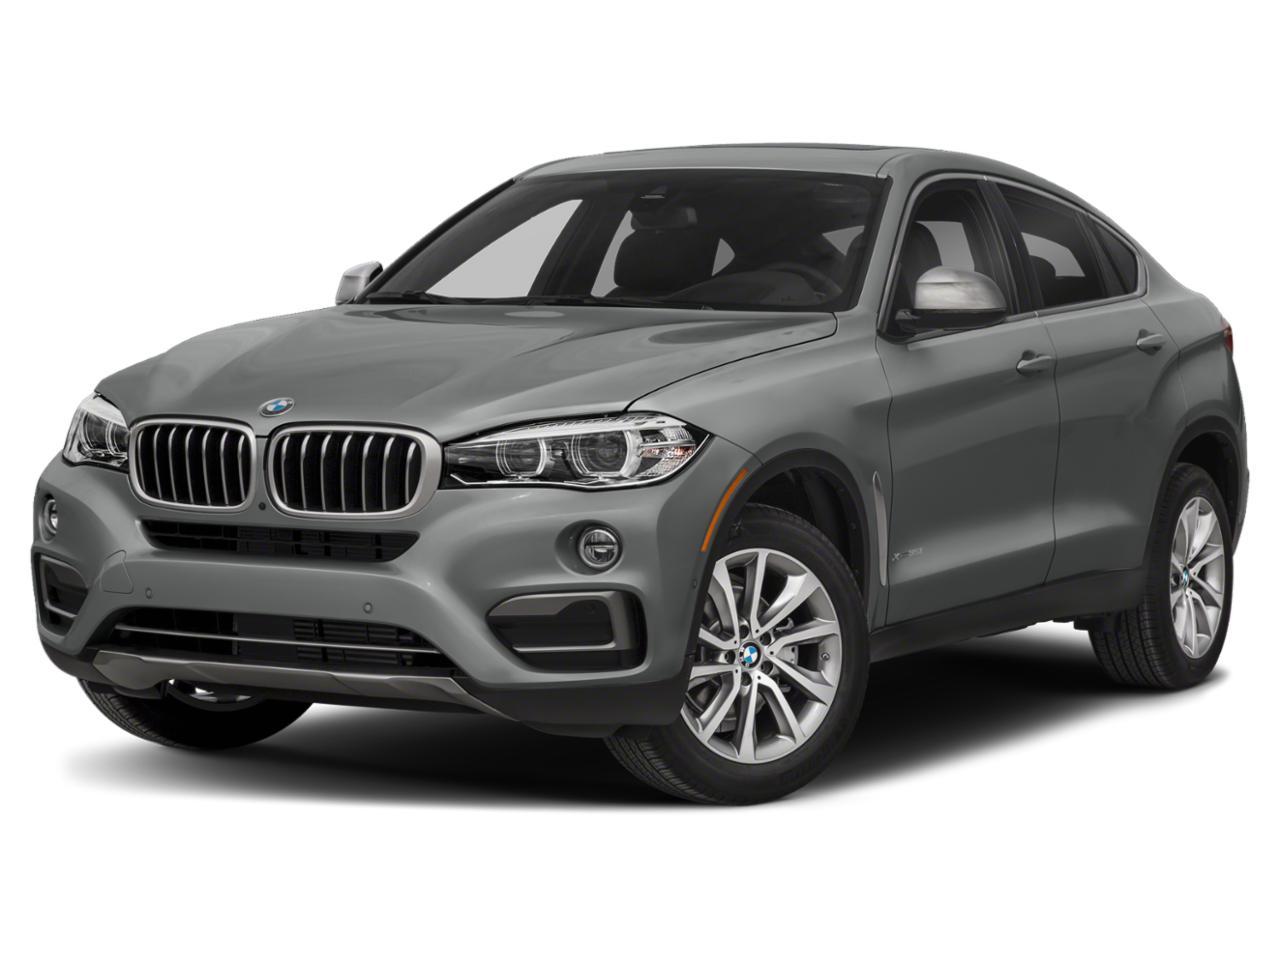 2018 BMW X6 xDrive50i Vehicle Photo in Charleston, SC 29407